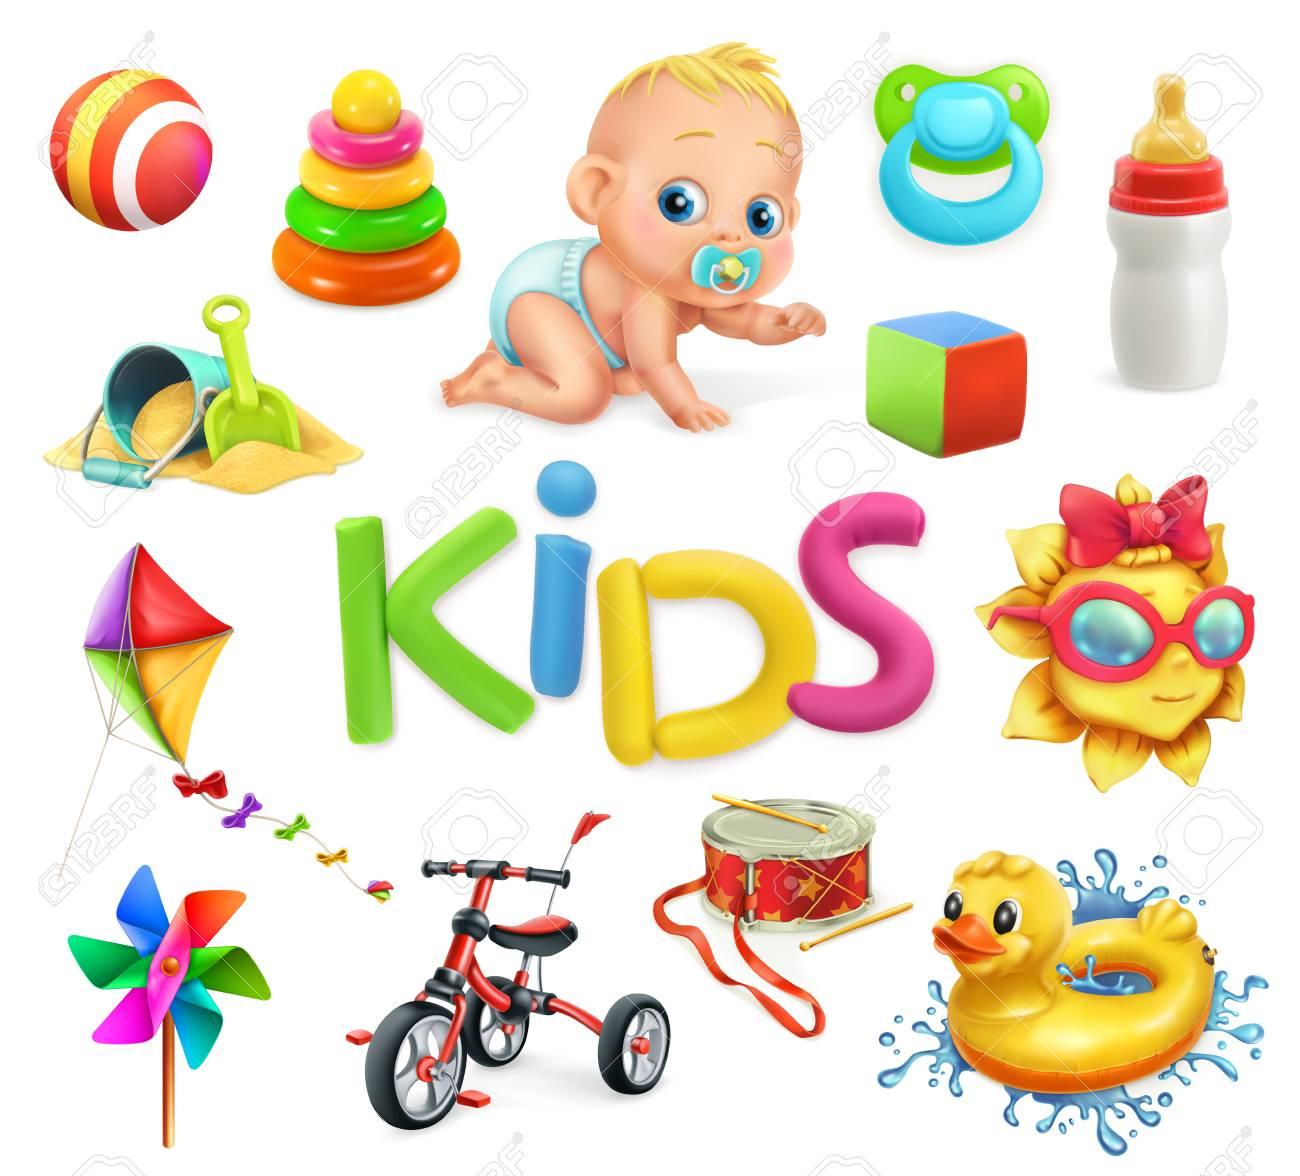 Kids and toys. Children playground, 3d vector illustration. - 99554543